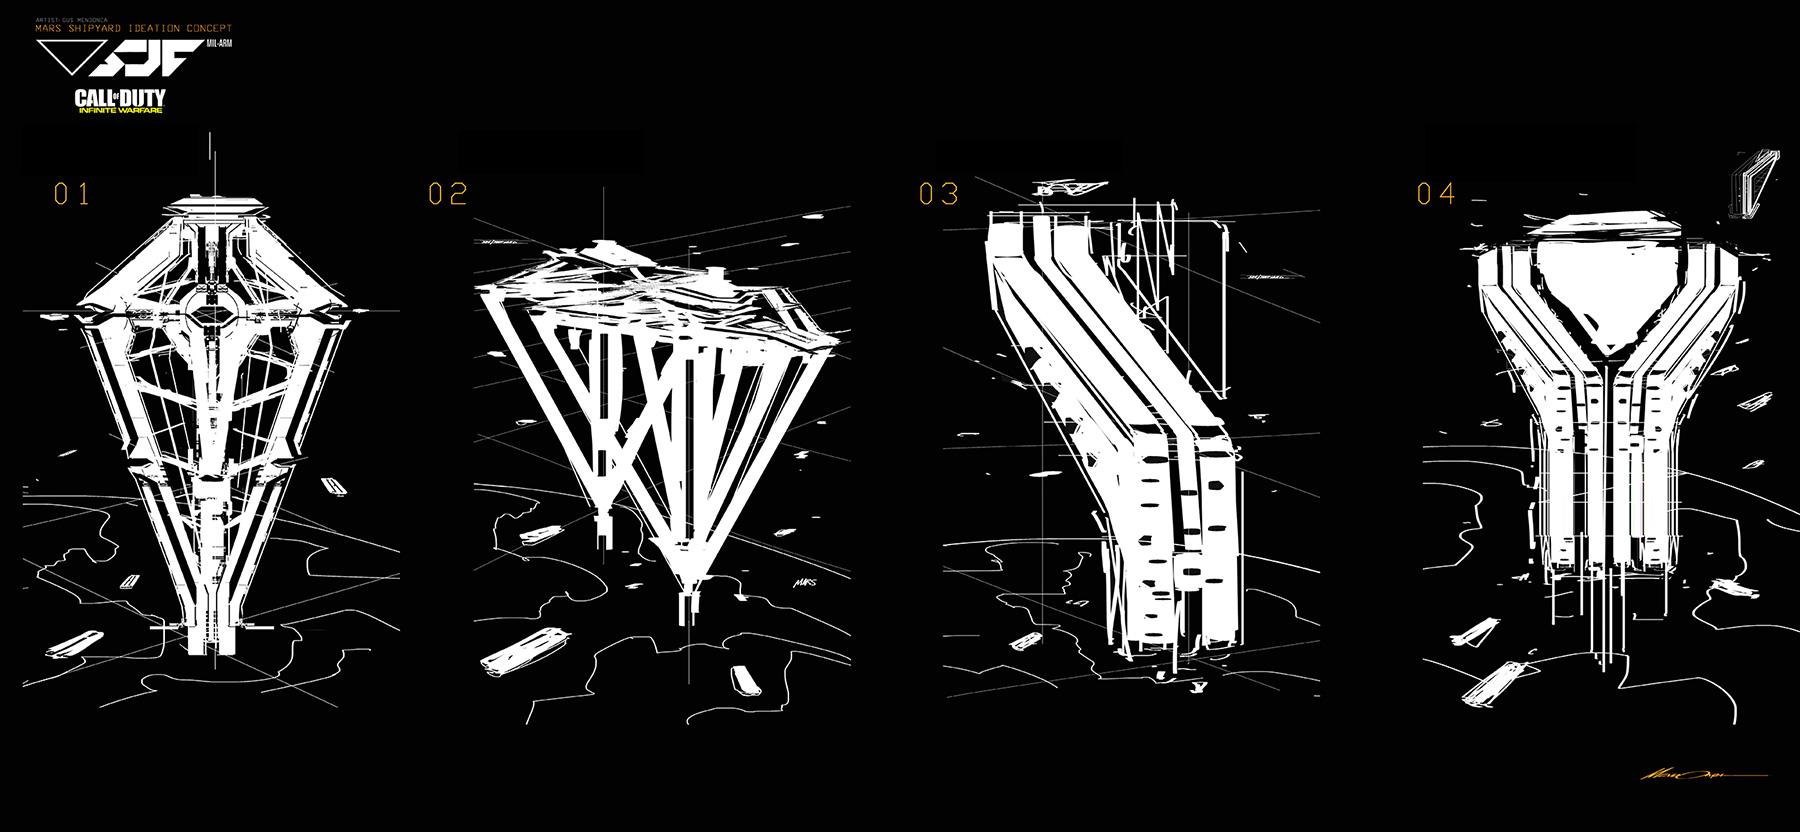 Call of Duty: Infinite Warfare Concept Art by Gustavo Mendonca